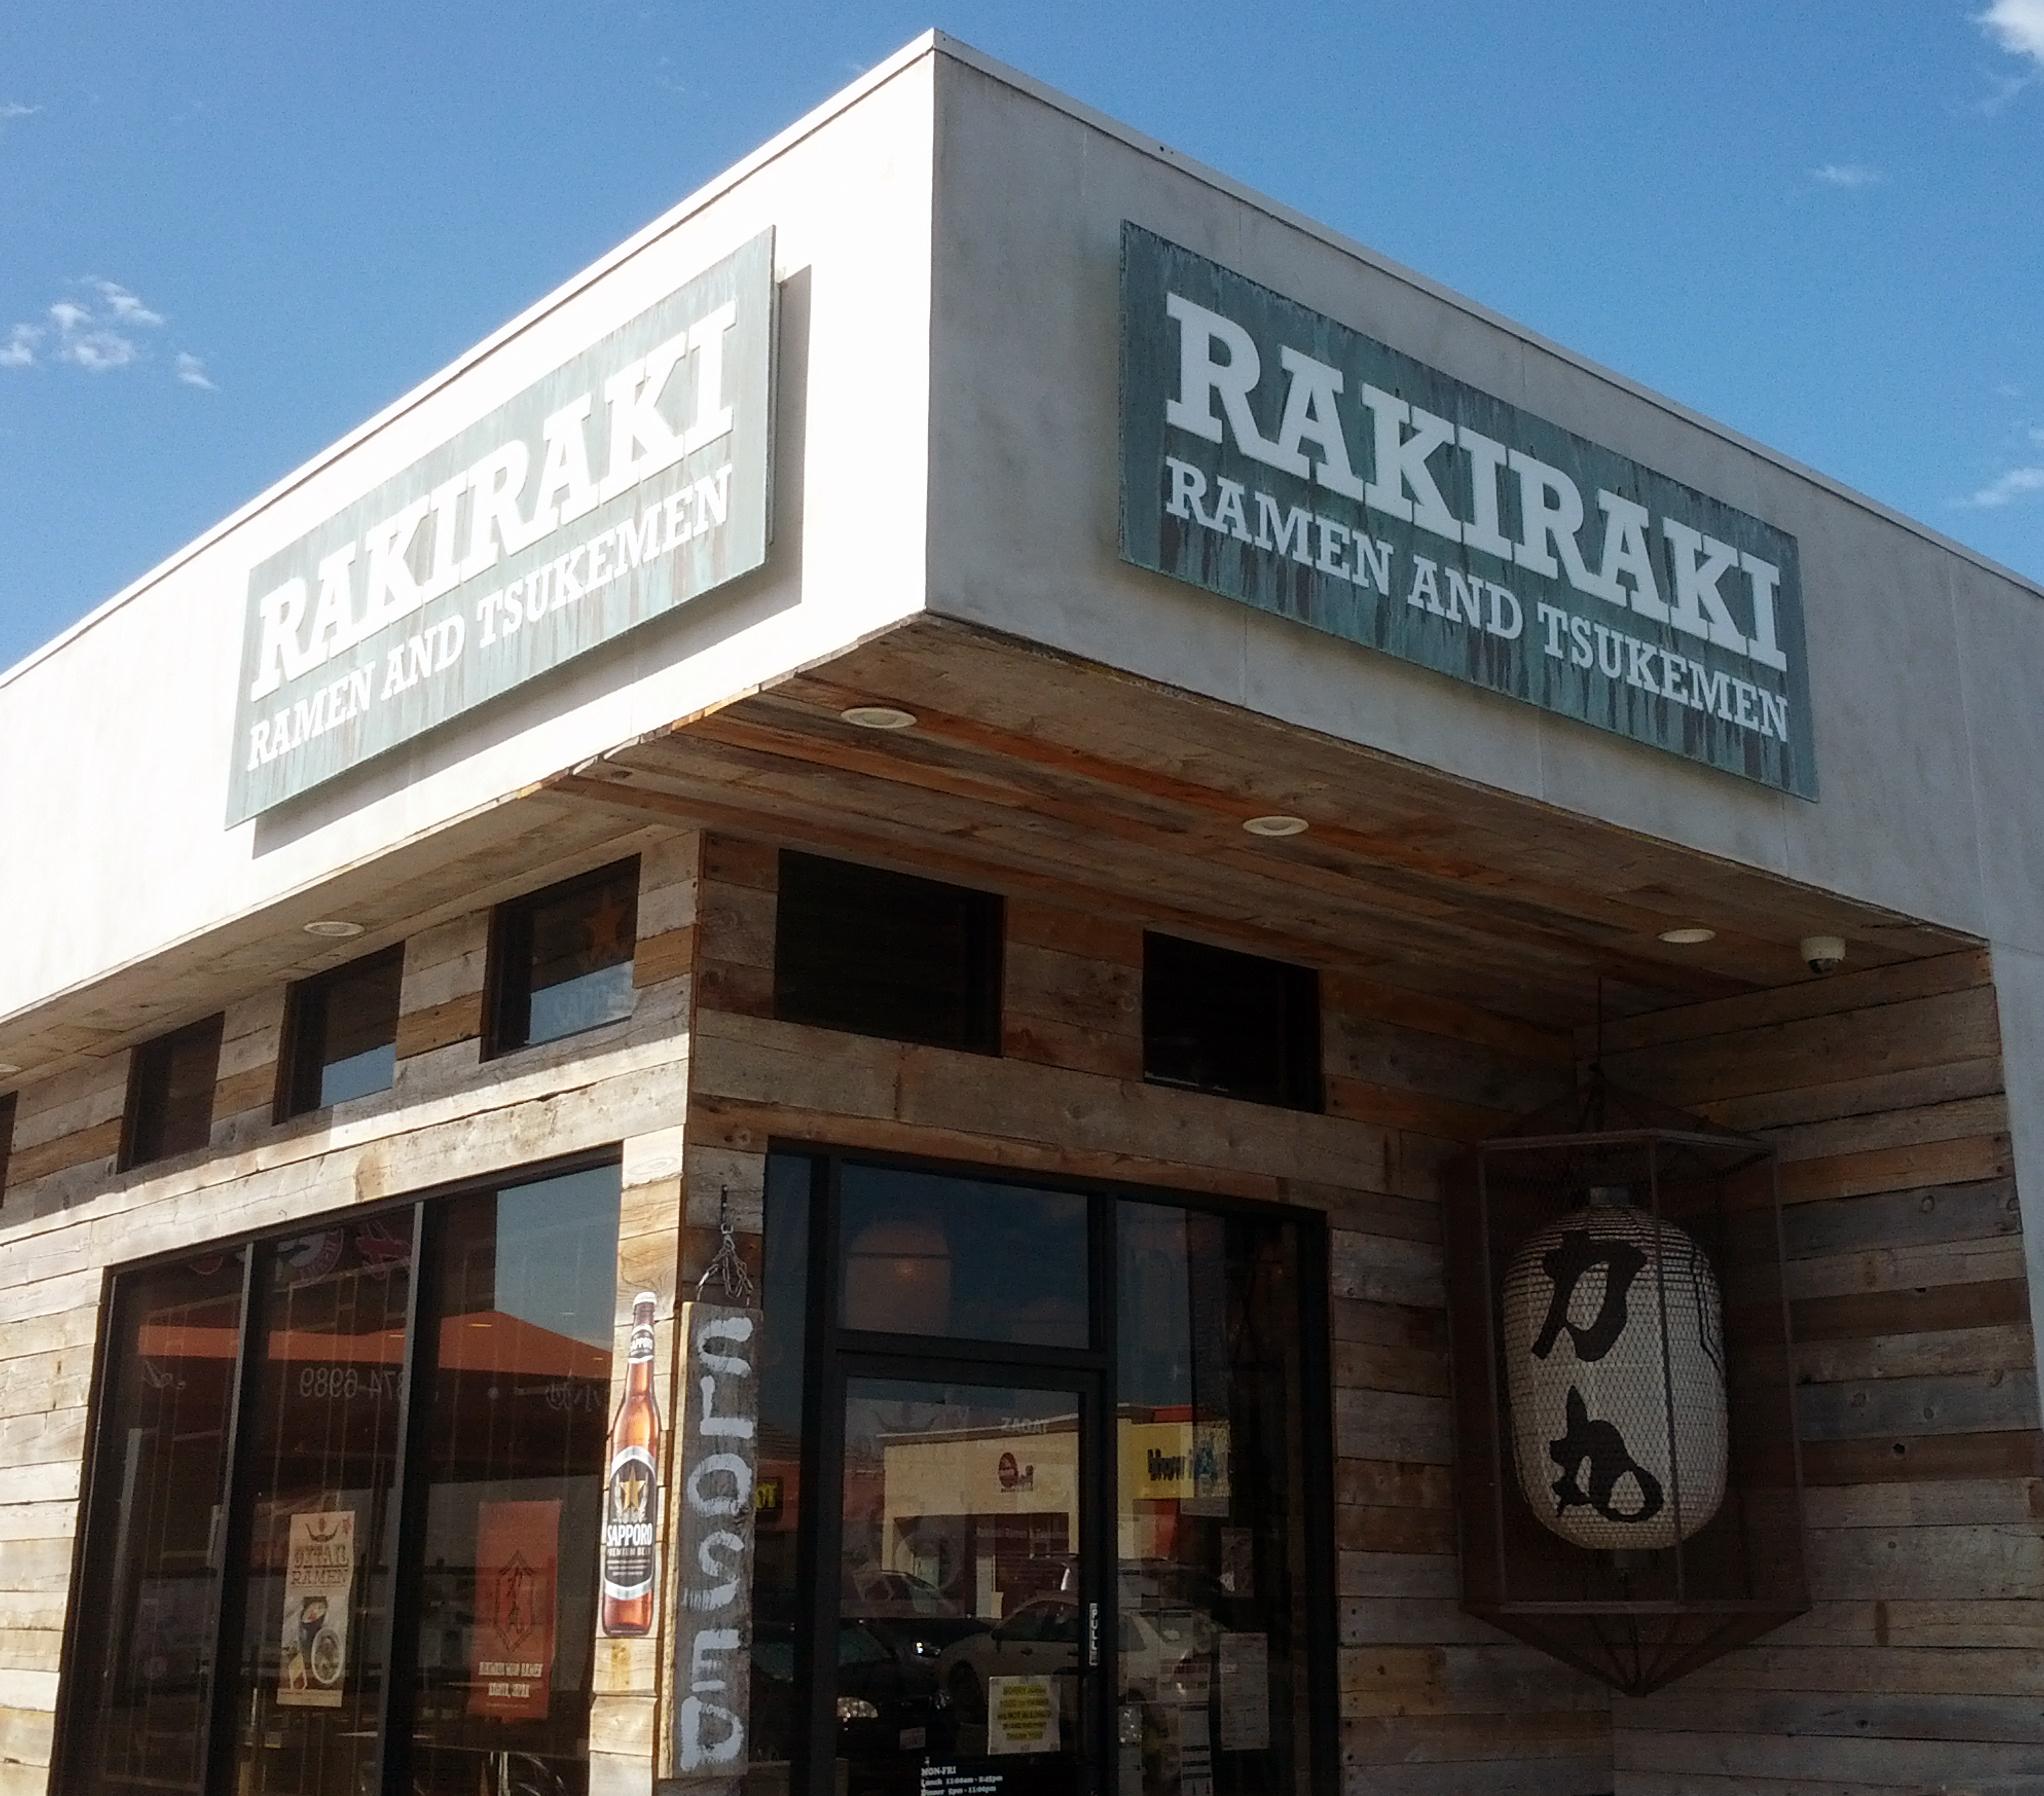 Restaurant Sign, Rakiraki, San Diego